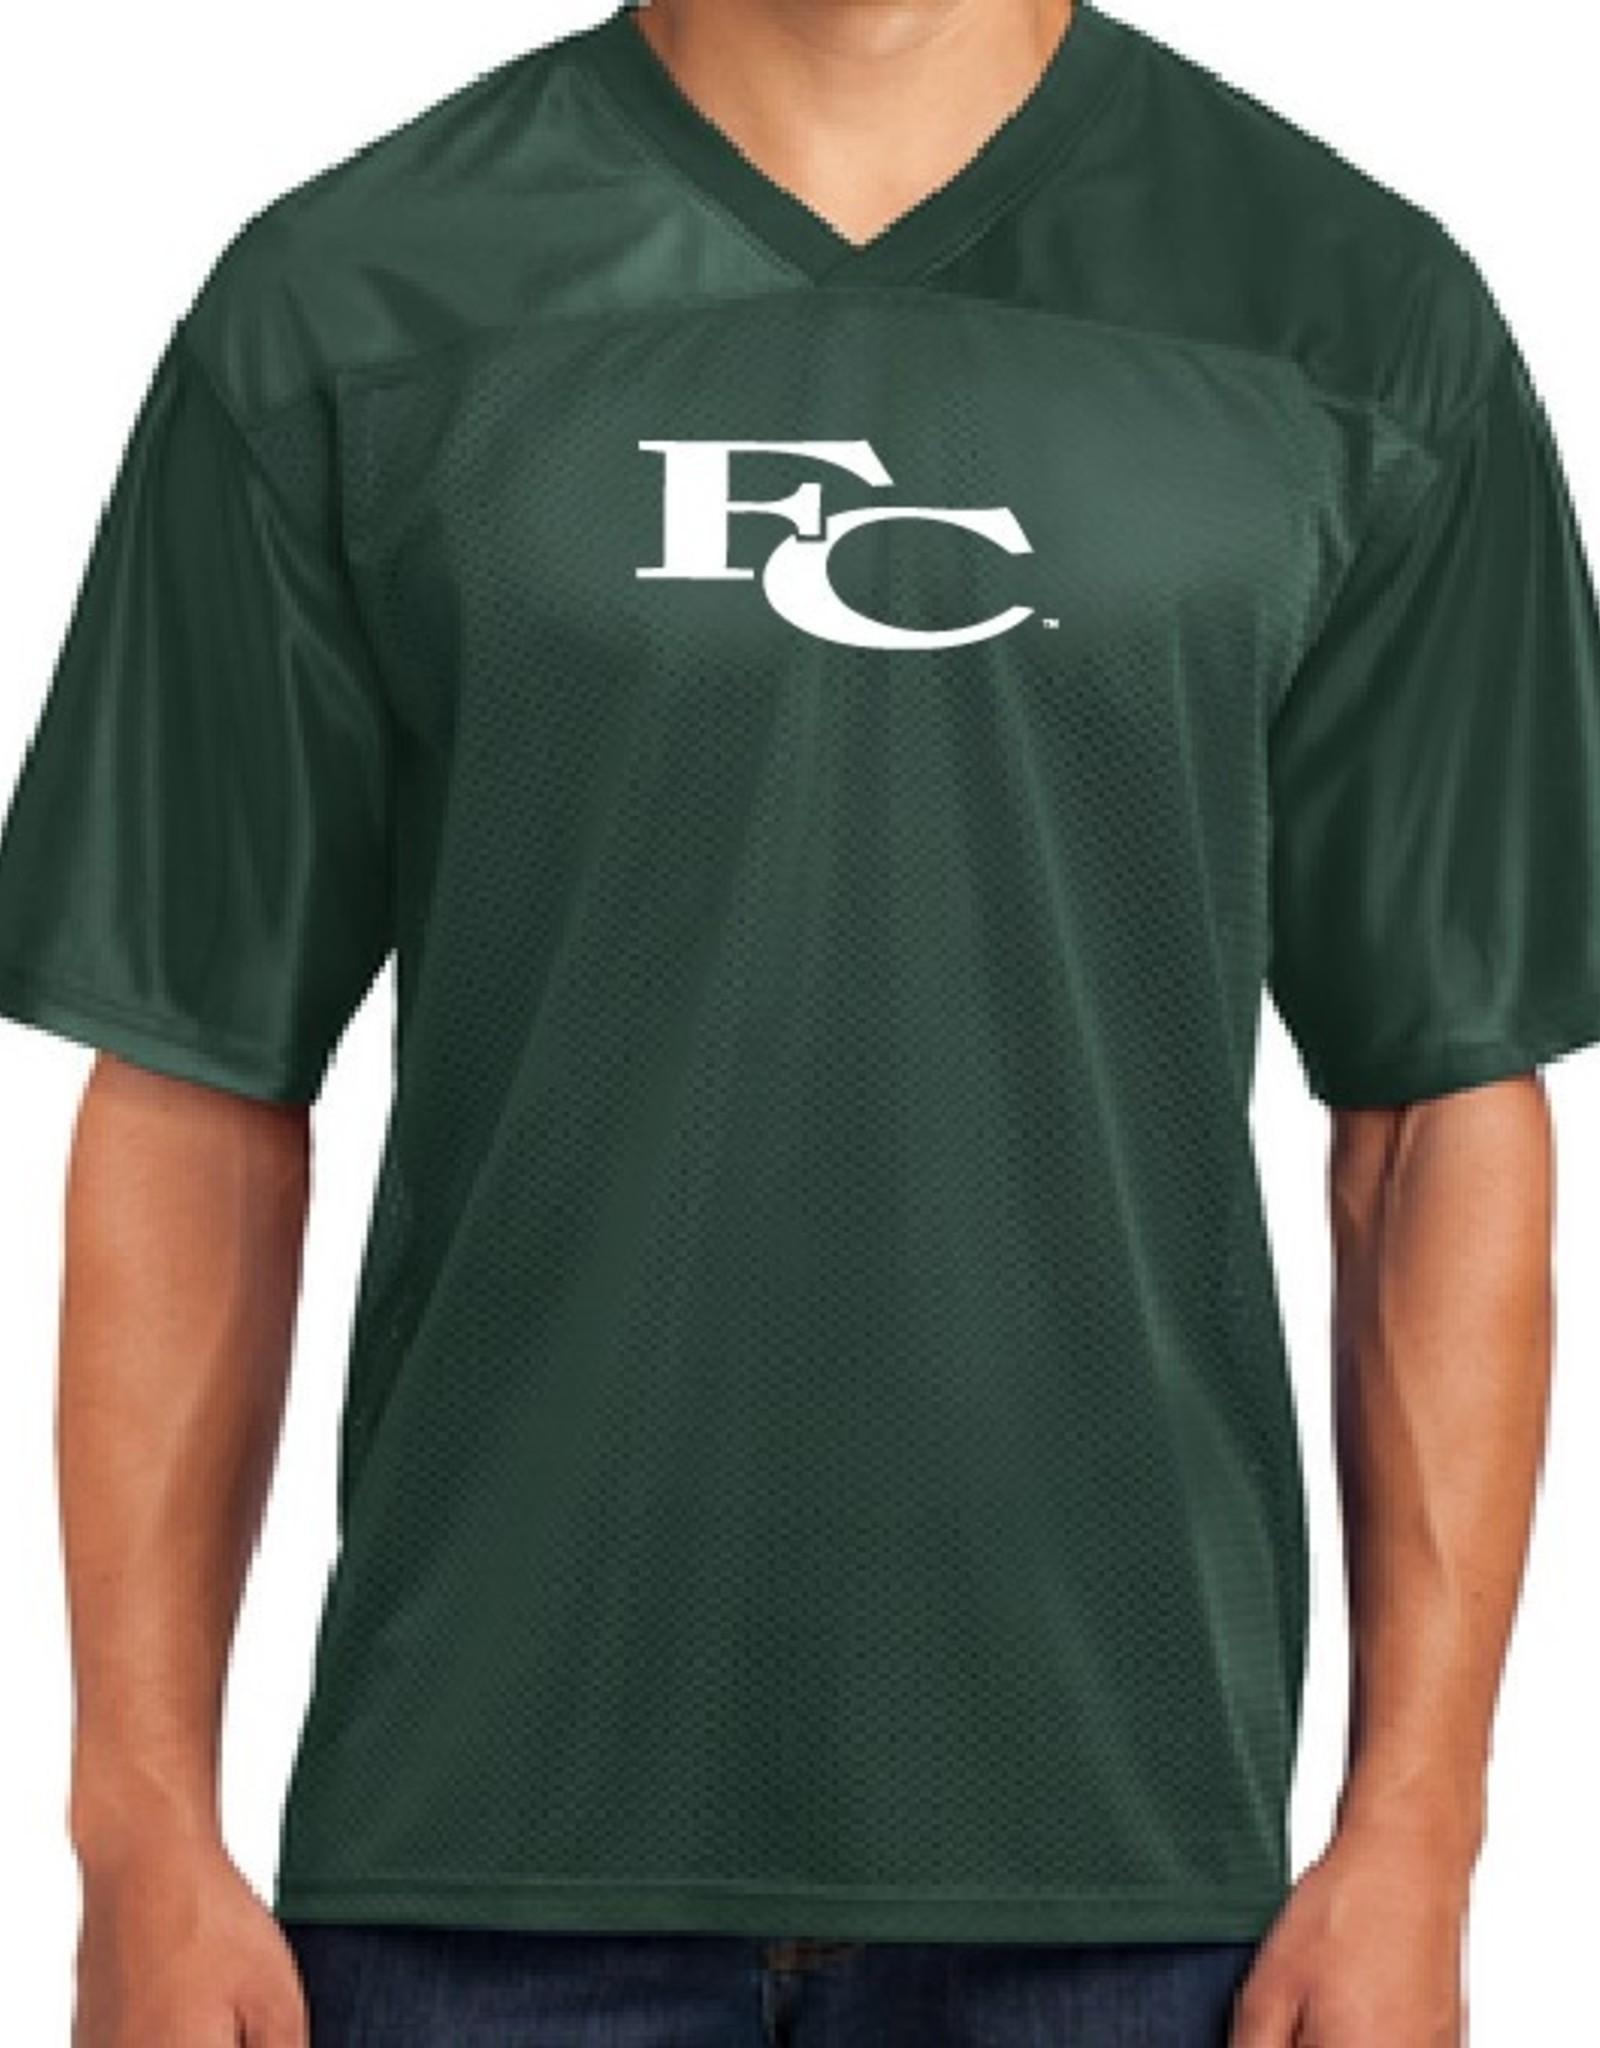 FC Custom Jersey Youth